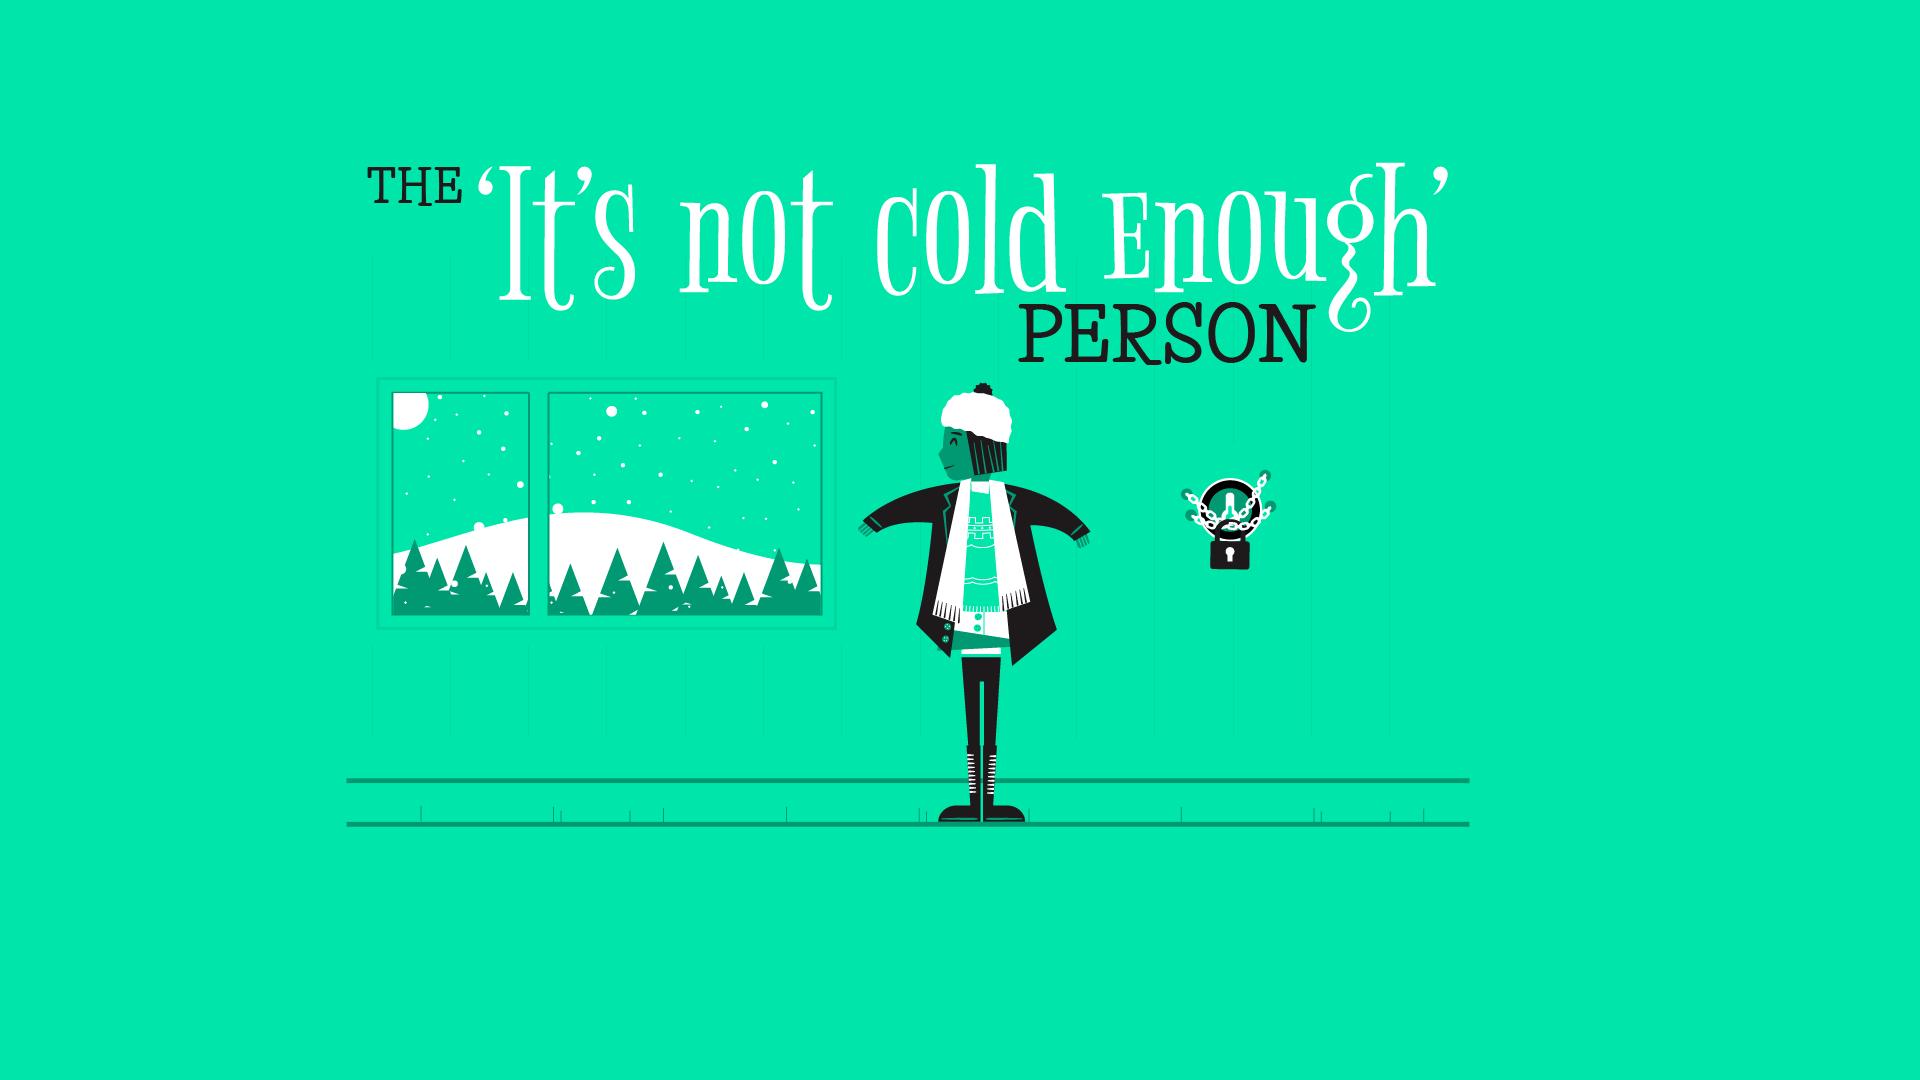 It's not cold enough